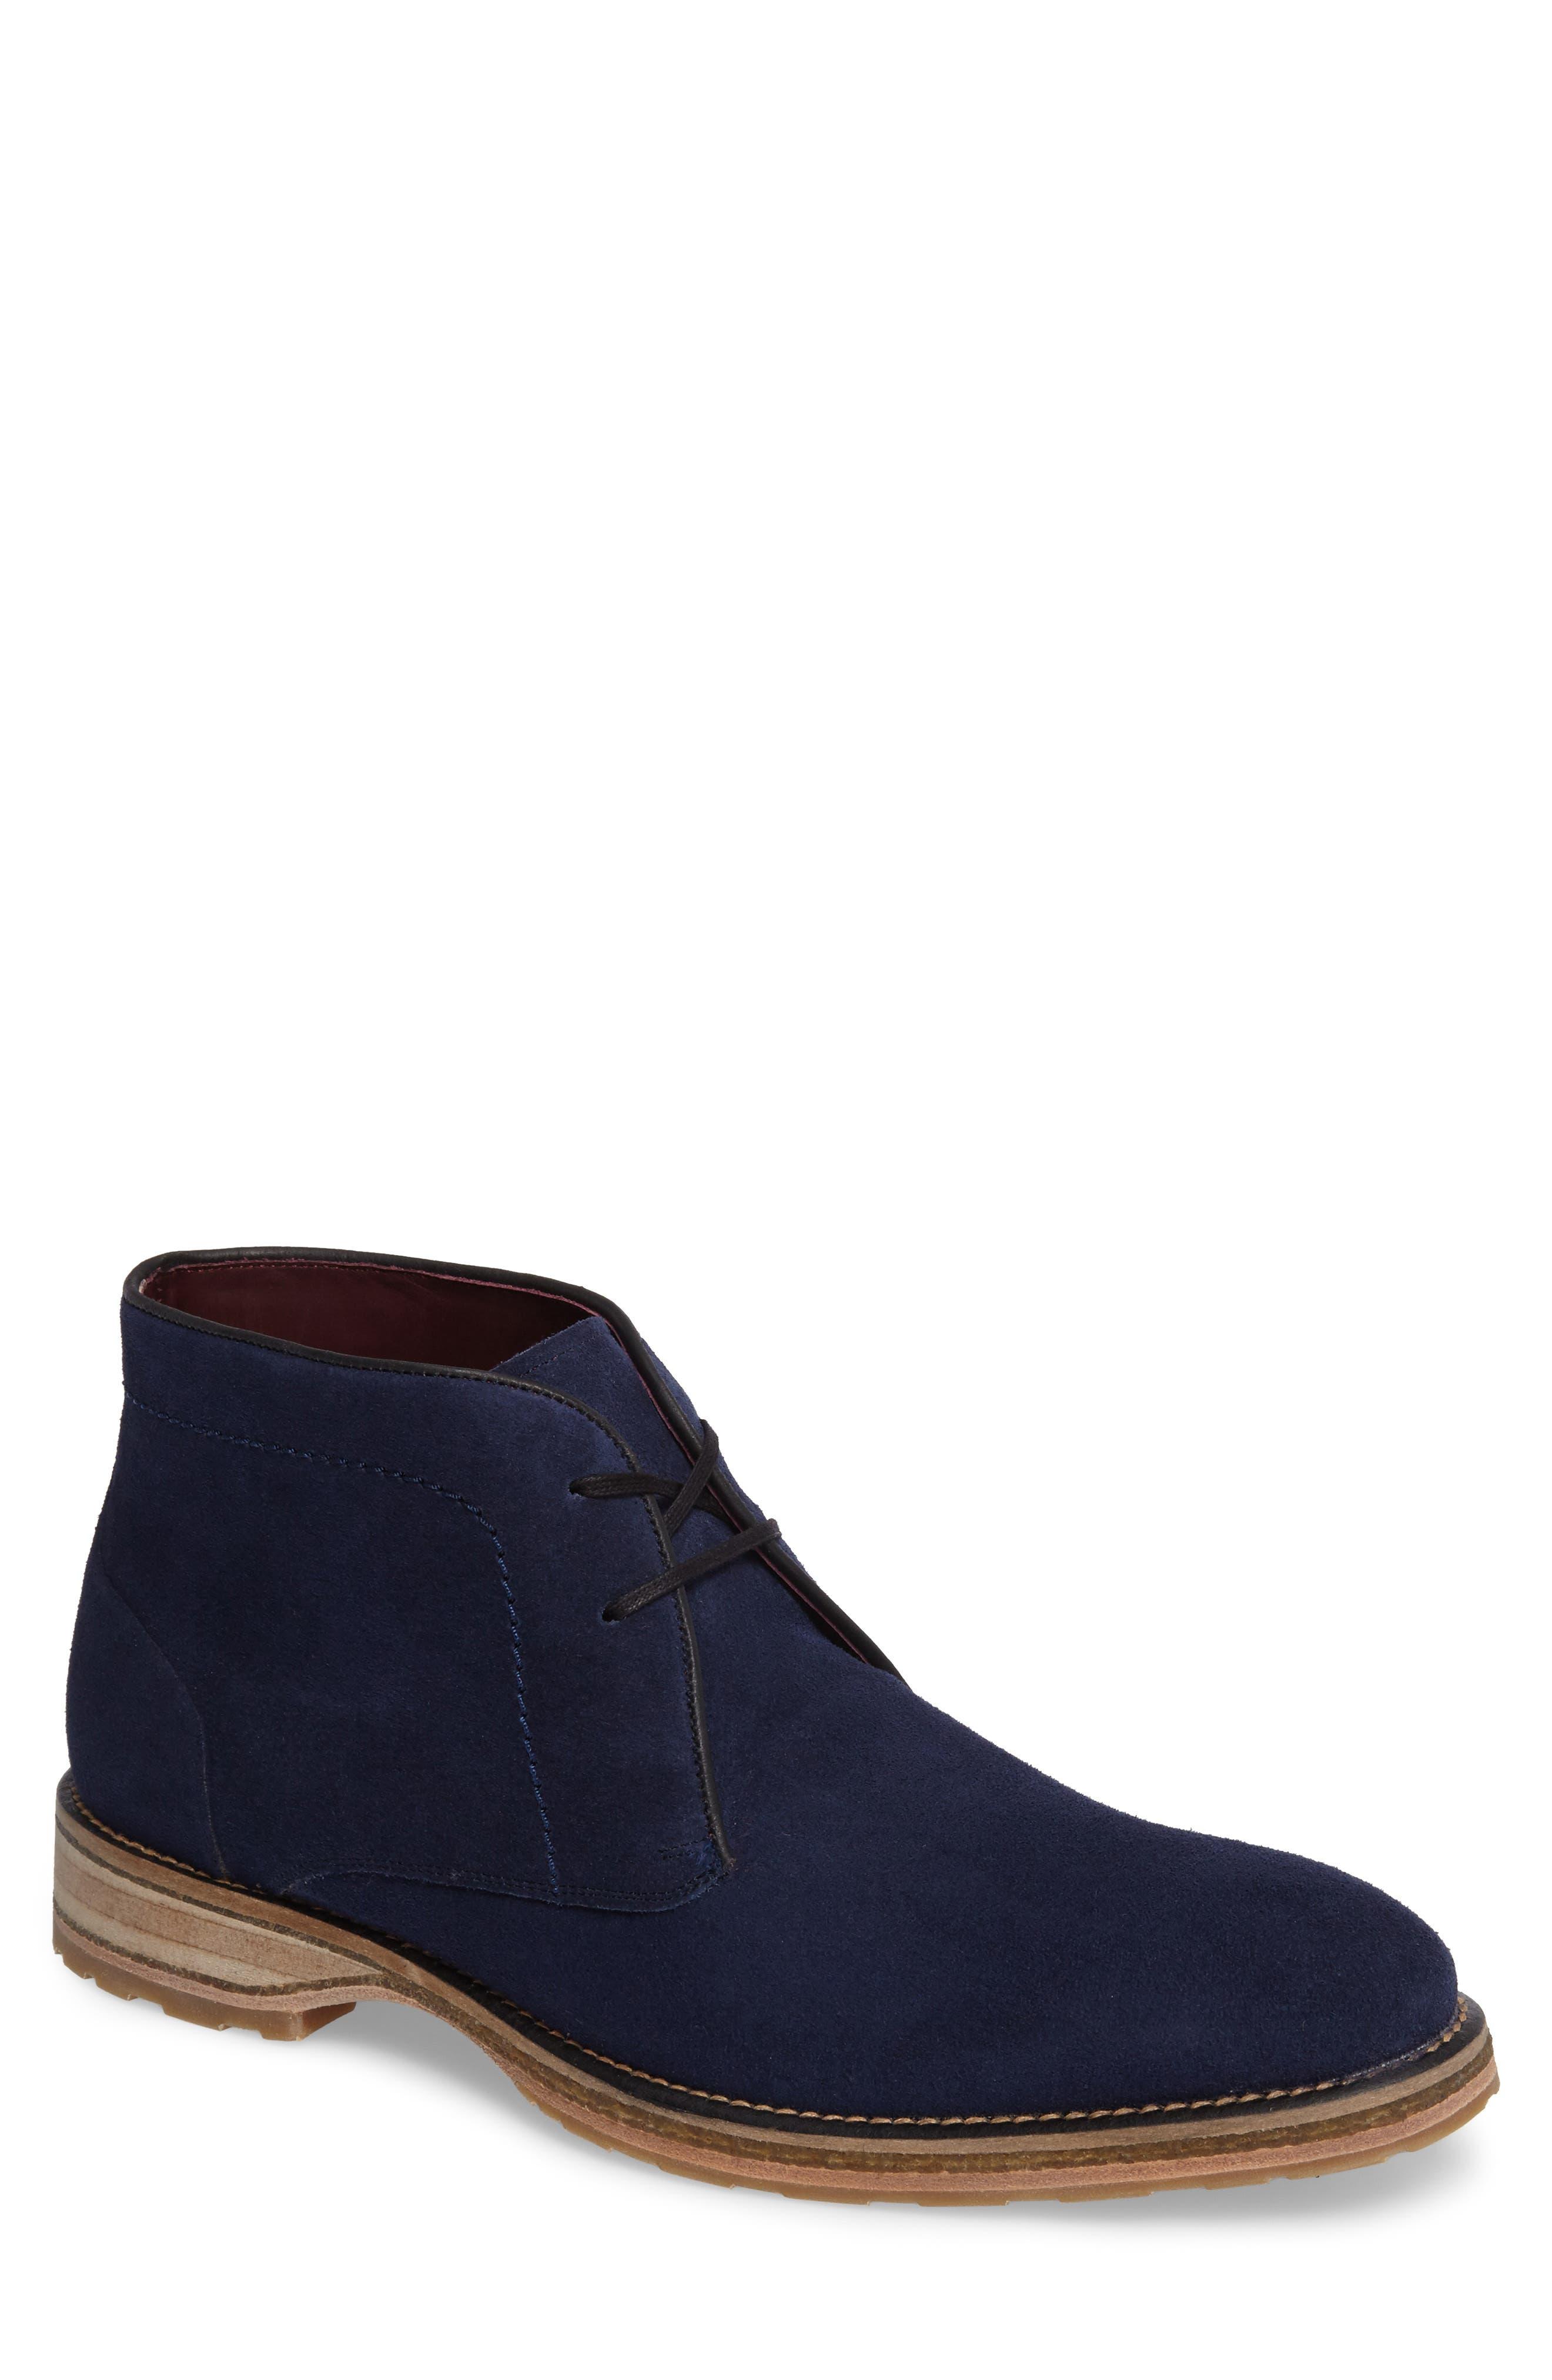 MEZLAN Dalias Chukka Boot, Main, color, BLUE SUEDE